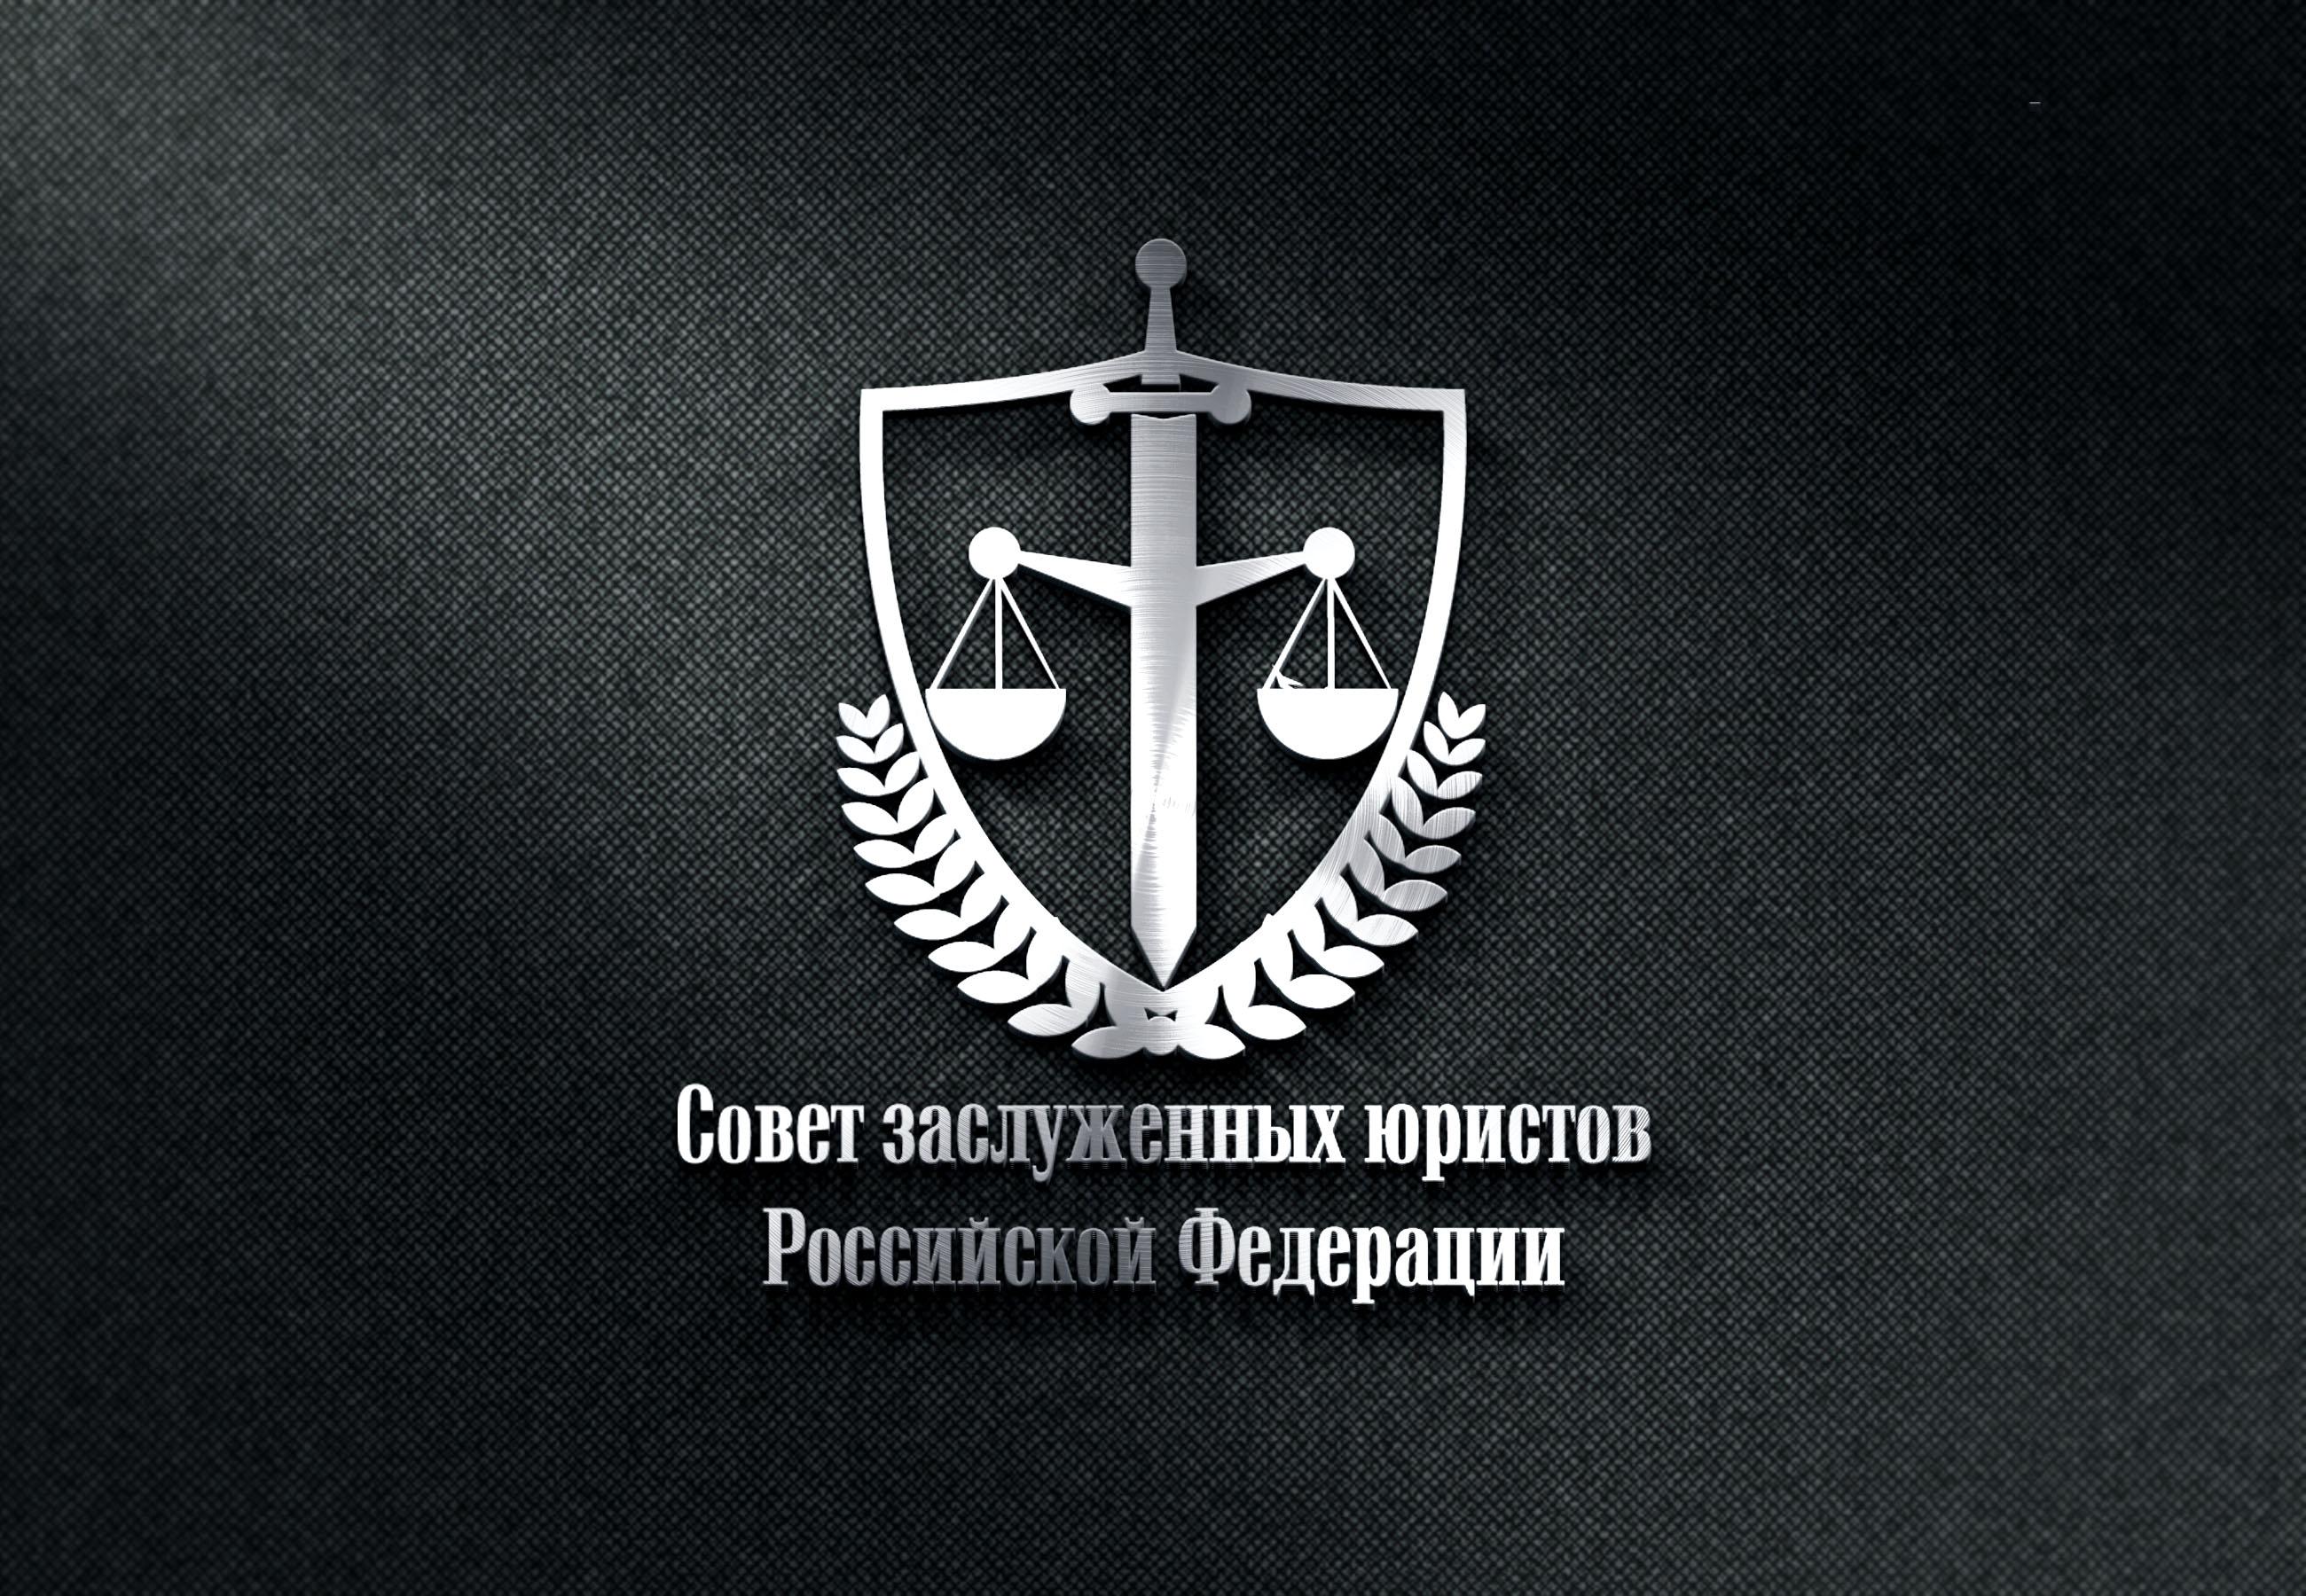 Разработка логотипа Совета (Клуба) заслуженных юристов Российской Федерации фото f_4195e3d50845a24a.jpg